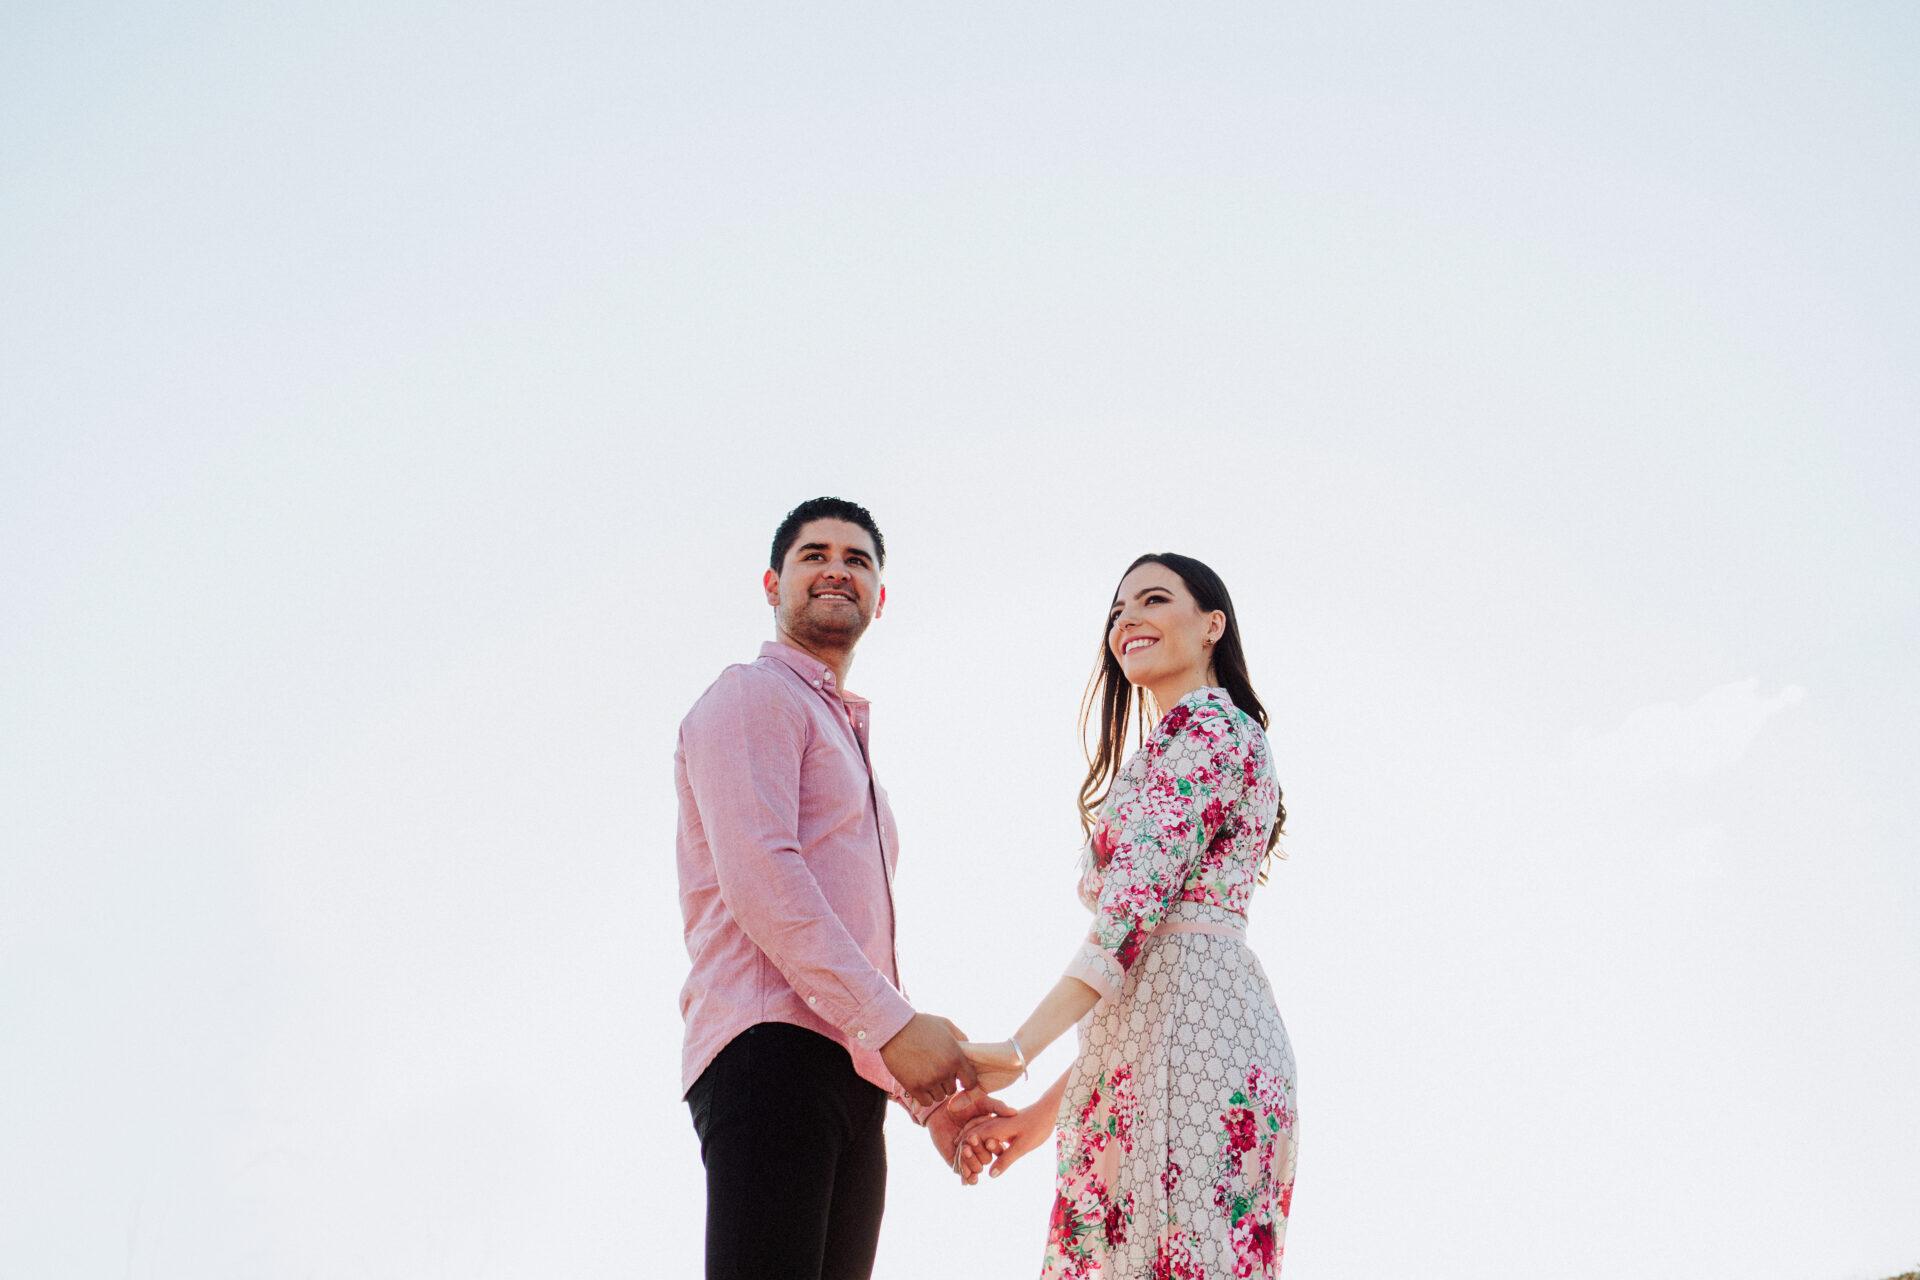 javier_noriega_fotografo_bodas_save_the_date_preboda_zacatecas_wedding_photographer6